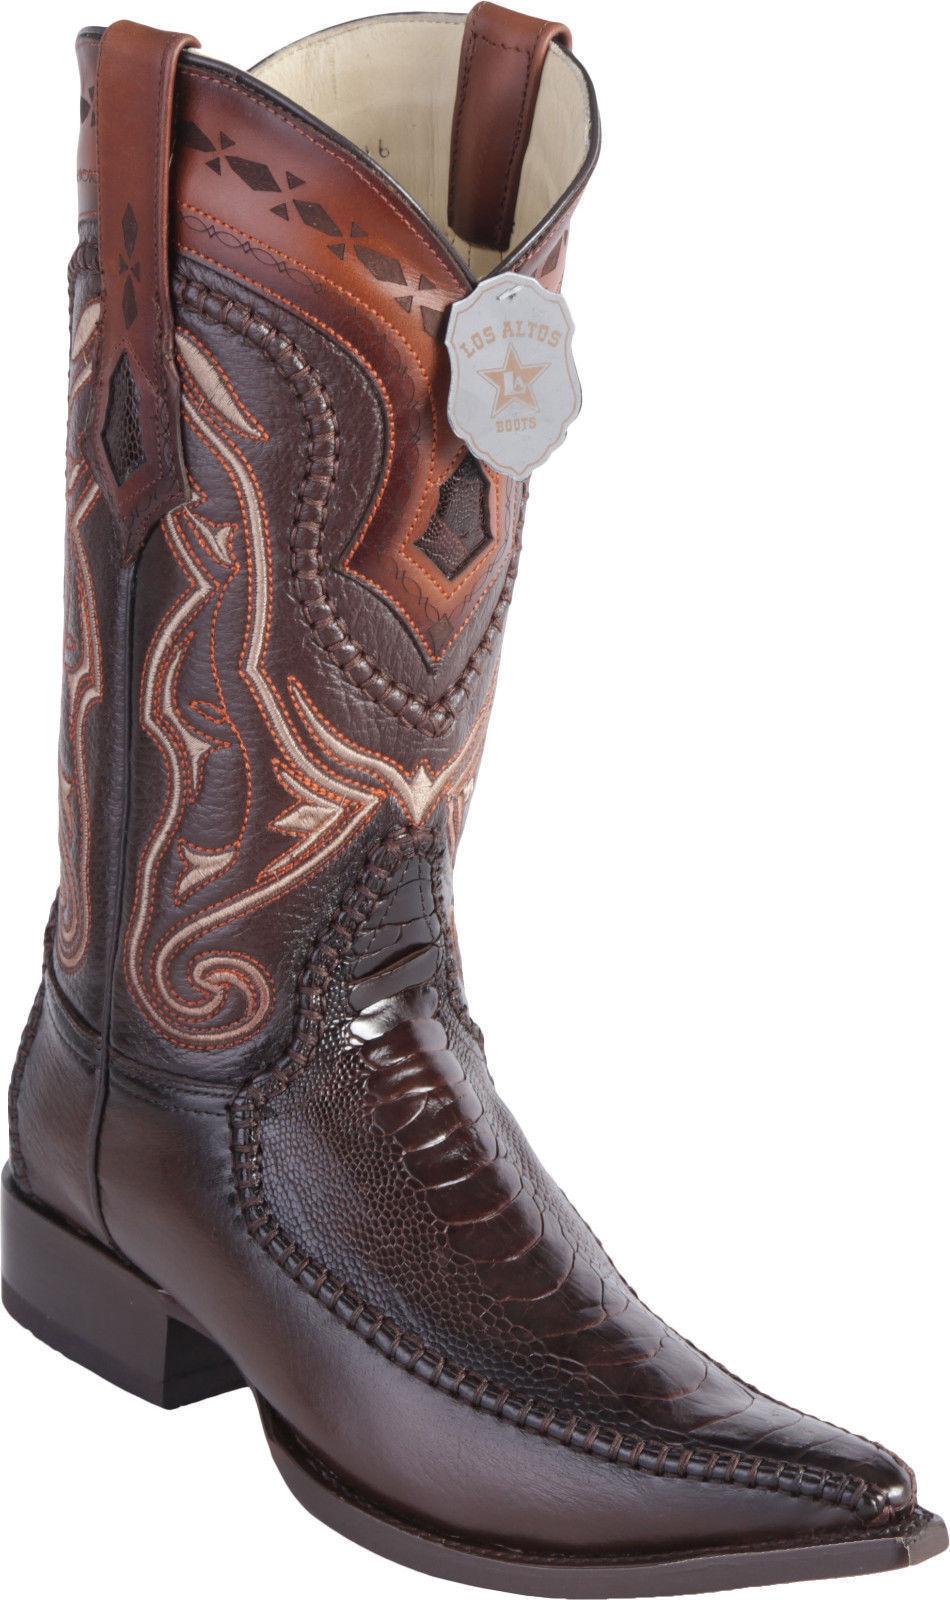 LOS ALTOS BROWN GENUINE OSTRICH LEG 3X TOE WESTERN COWBOY BOOT EE+